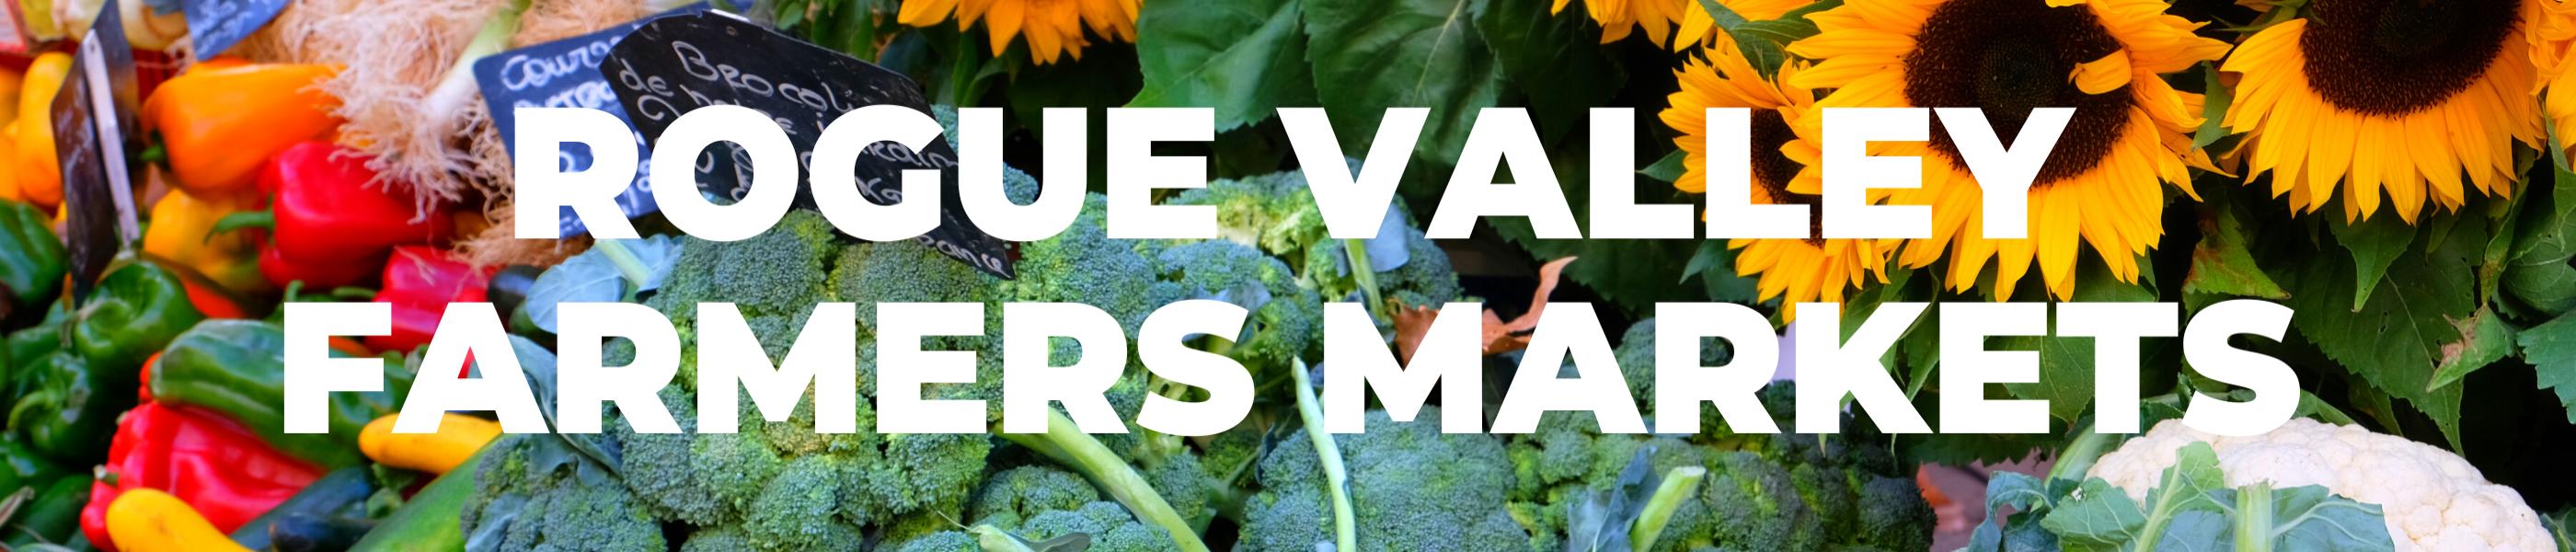 Rogue valley farmers markets, fresh produce,